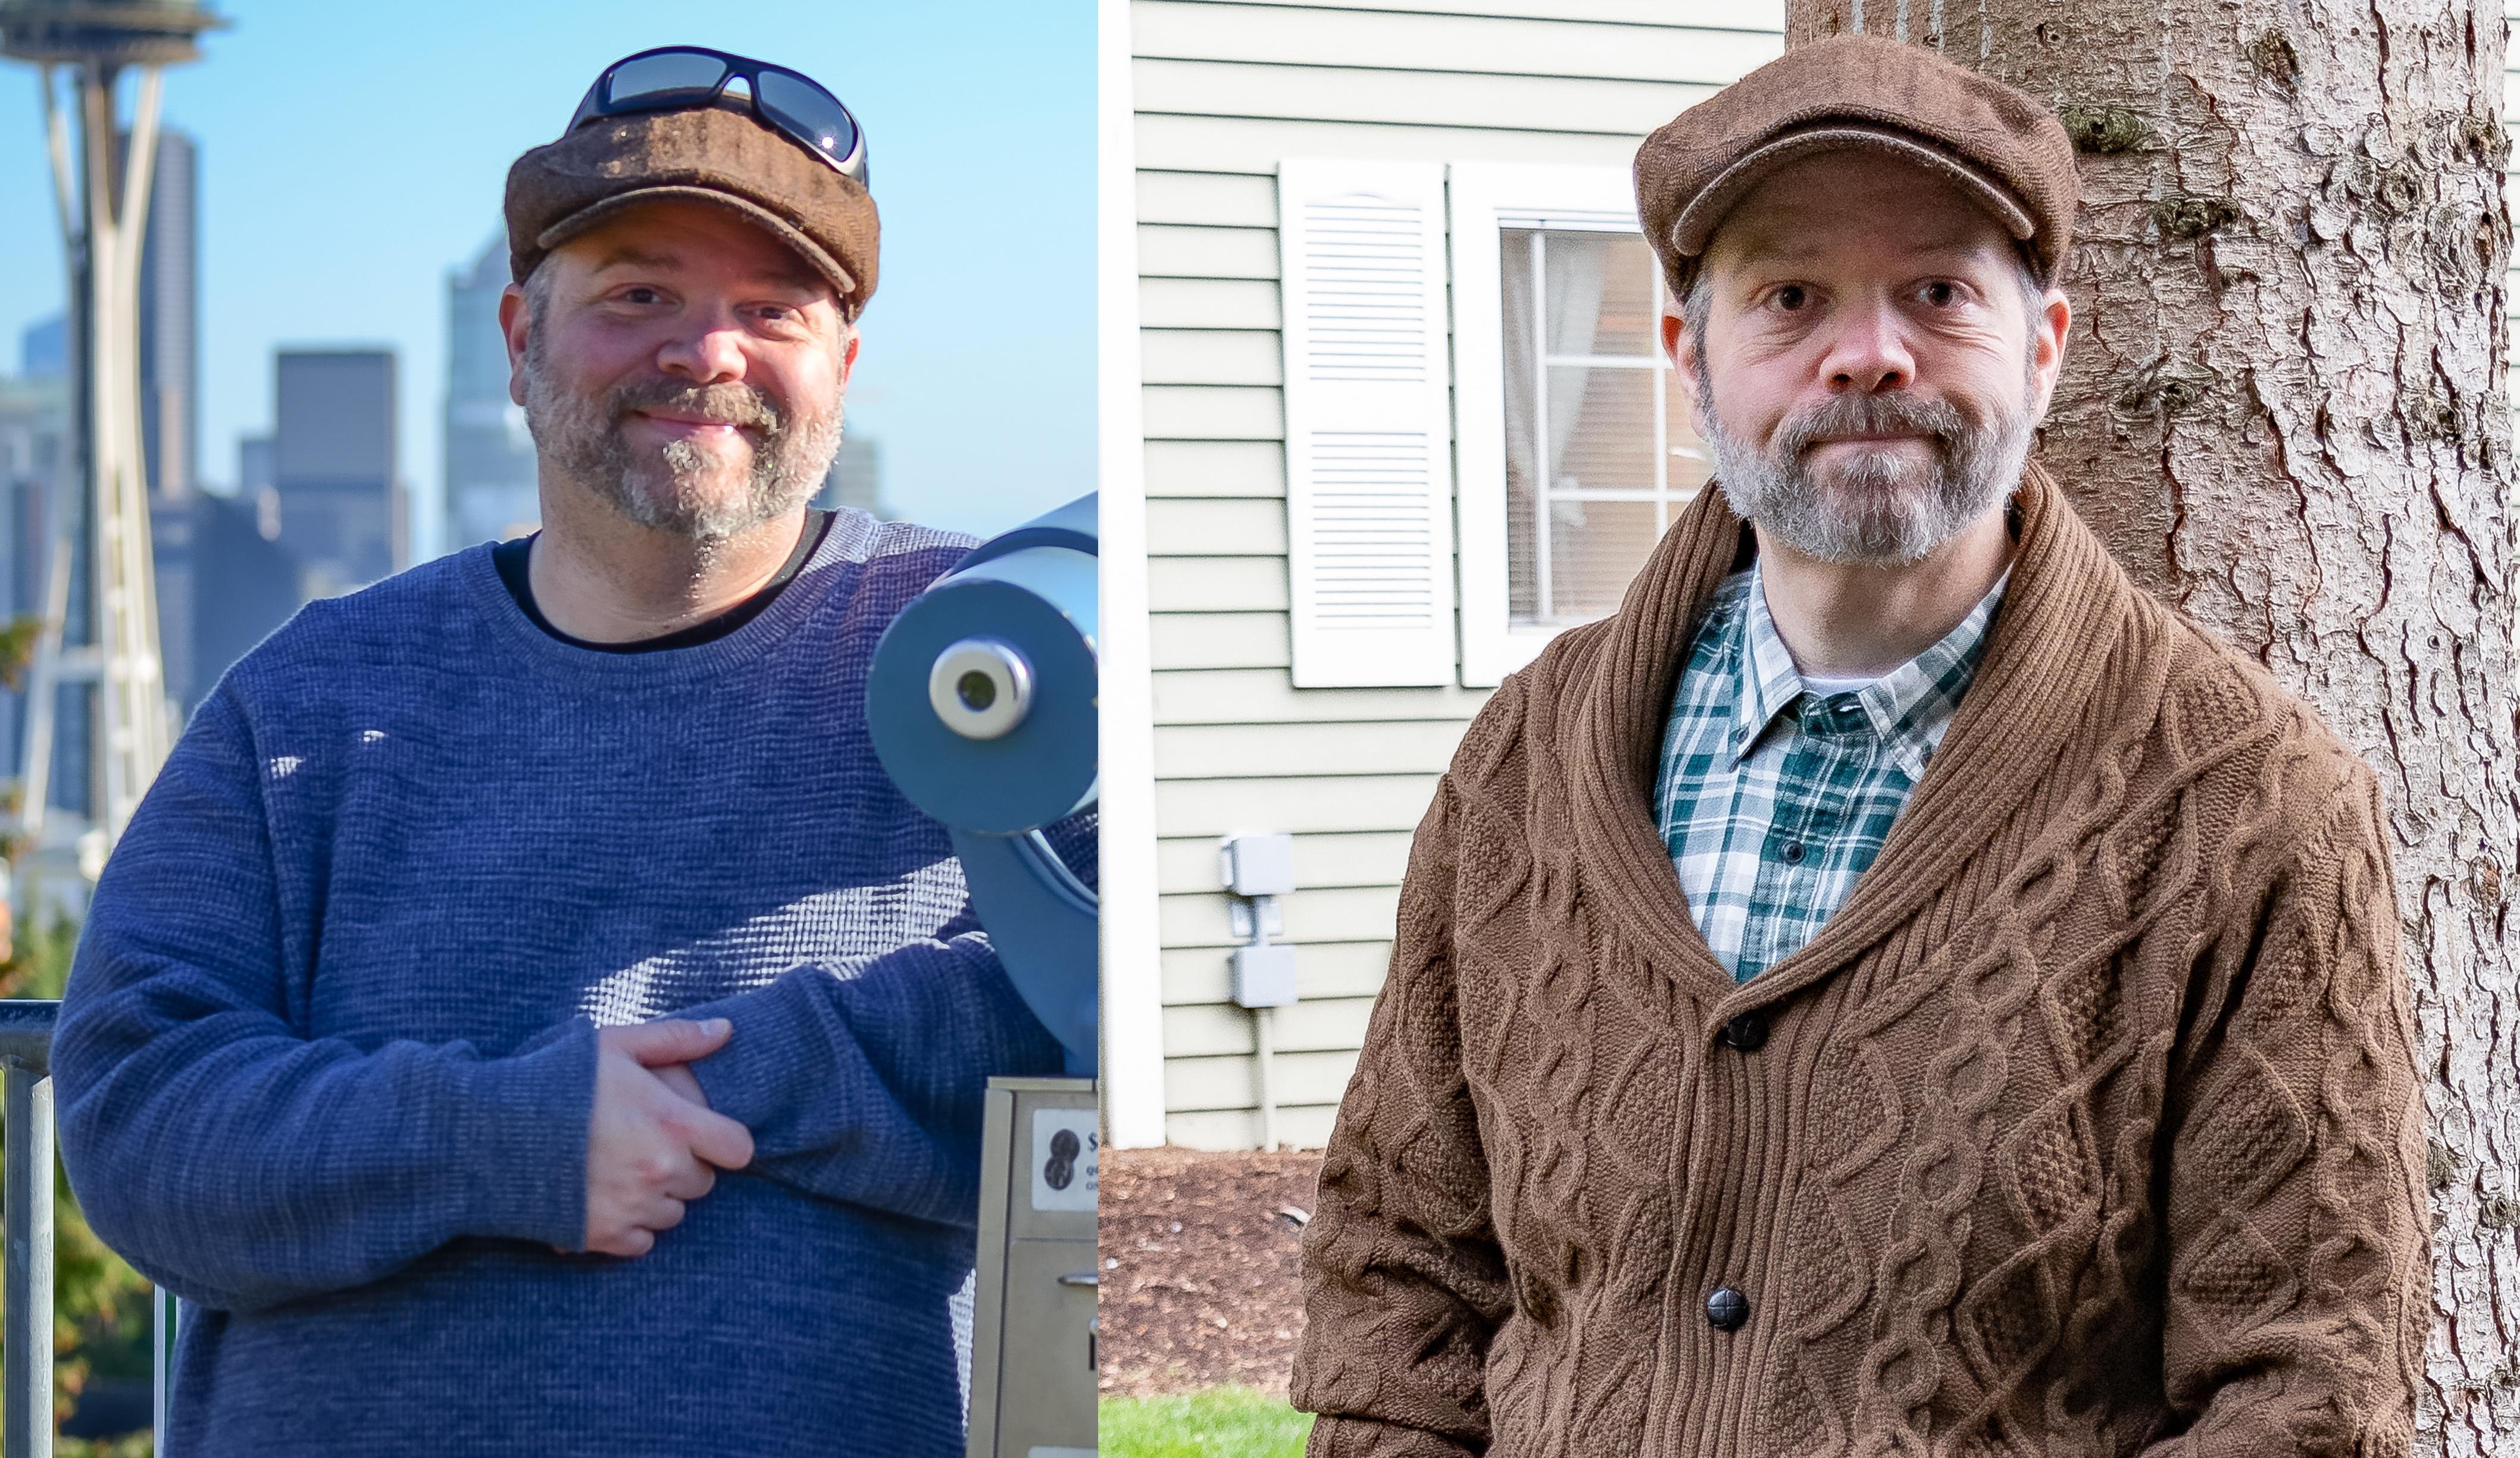 Progress Pics of 140 lbs Weight Loss 5'10 Male 325 lbs to 185 lbs